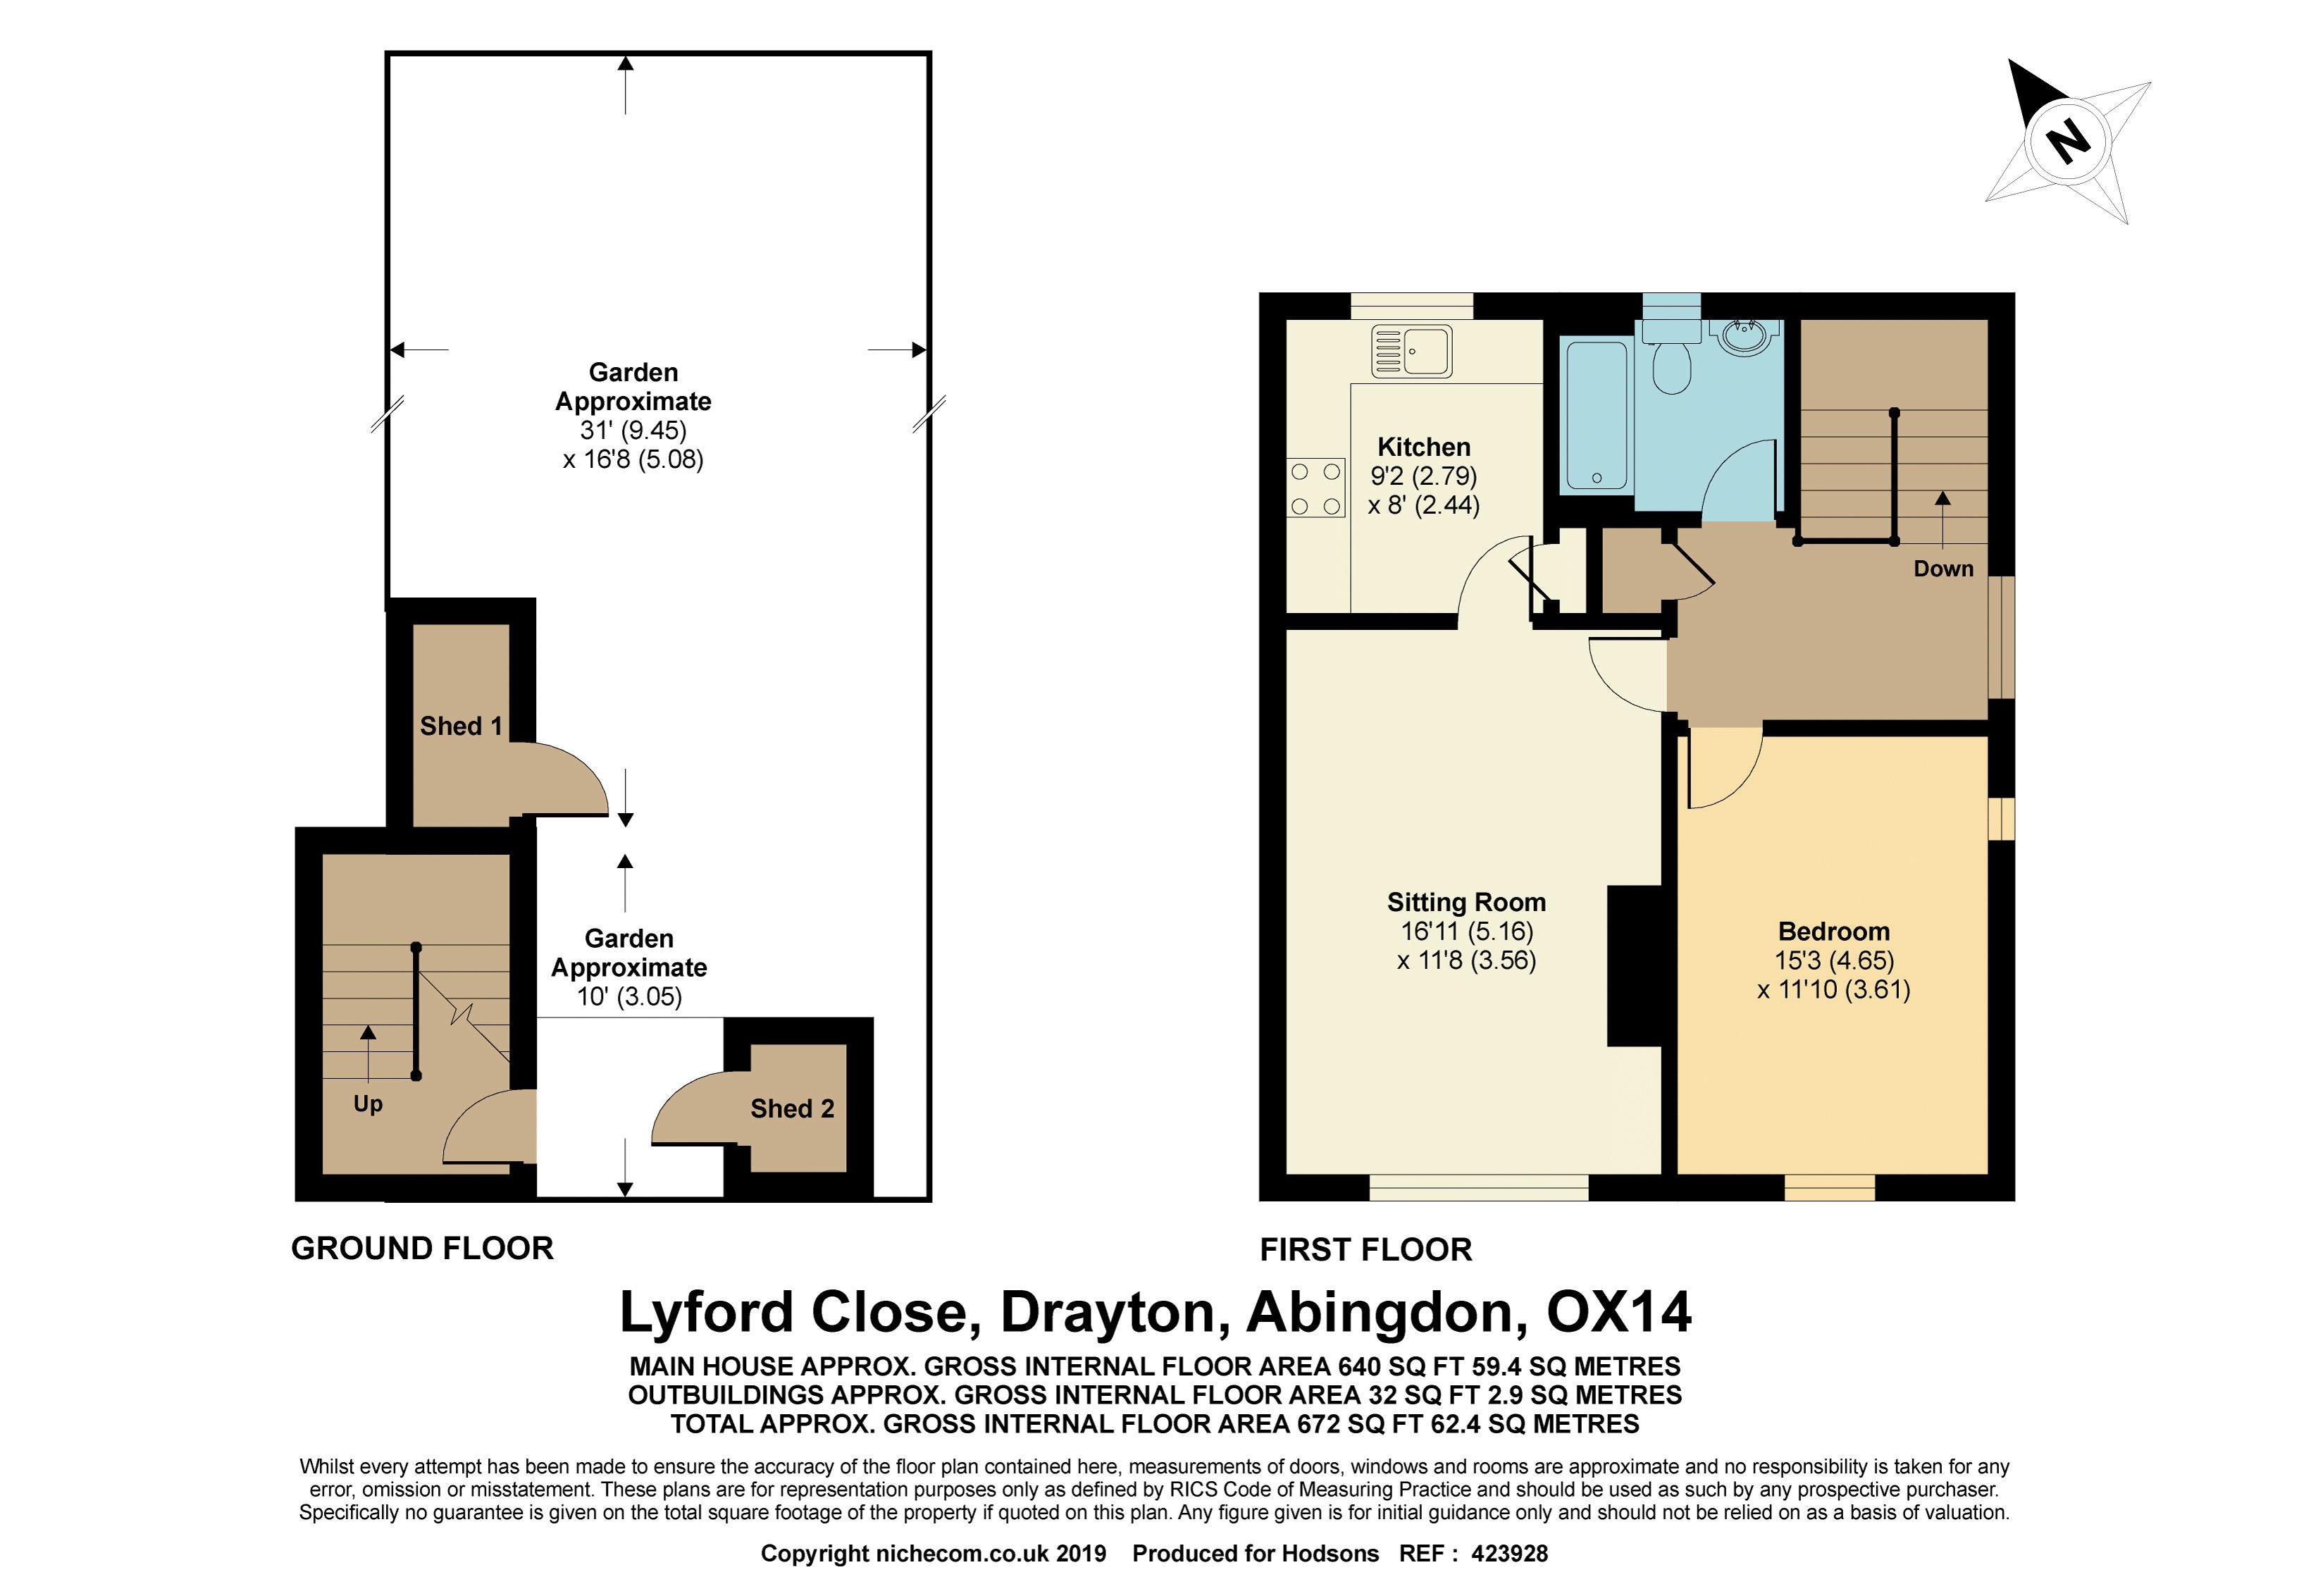 Lyford Close Drayton